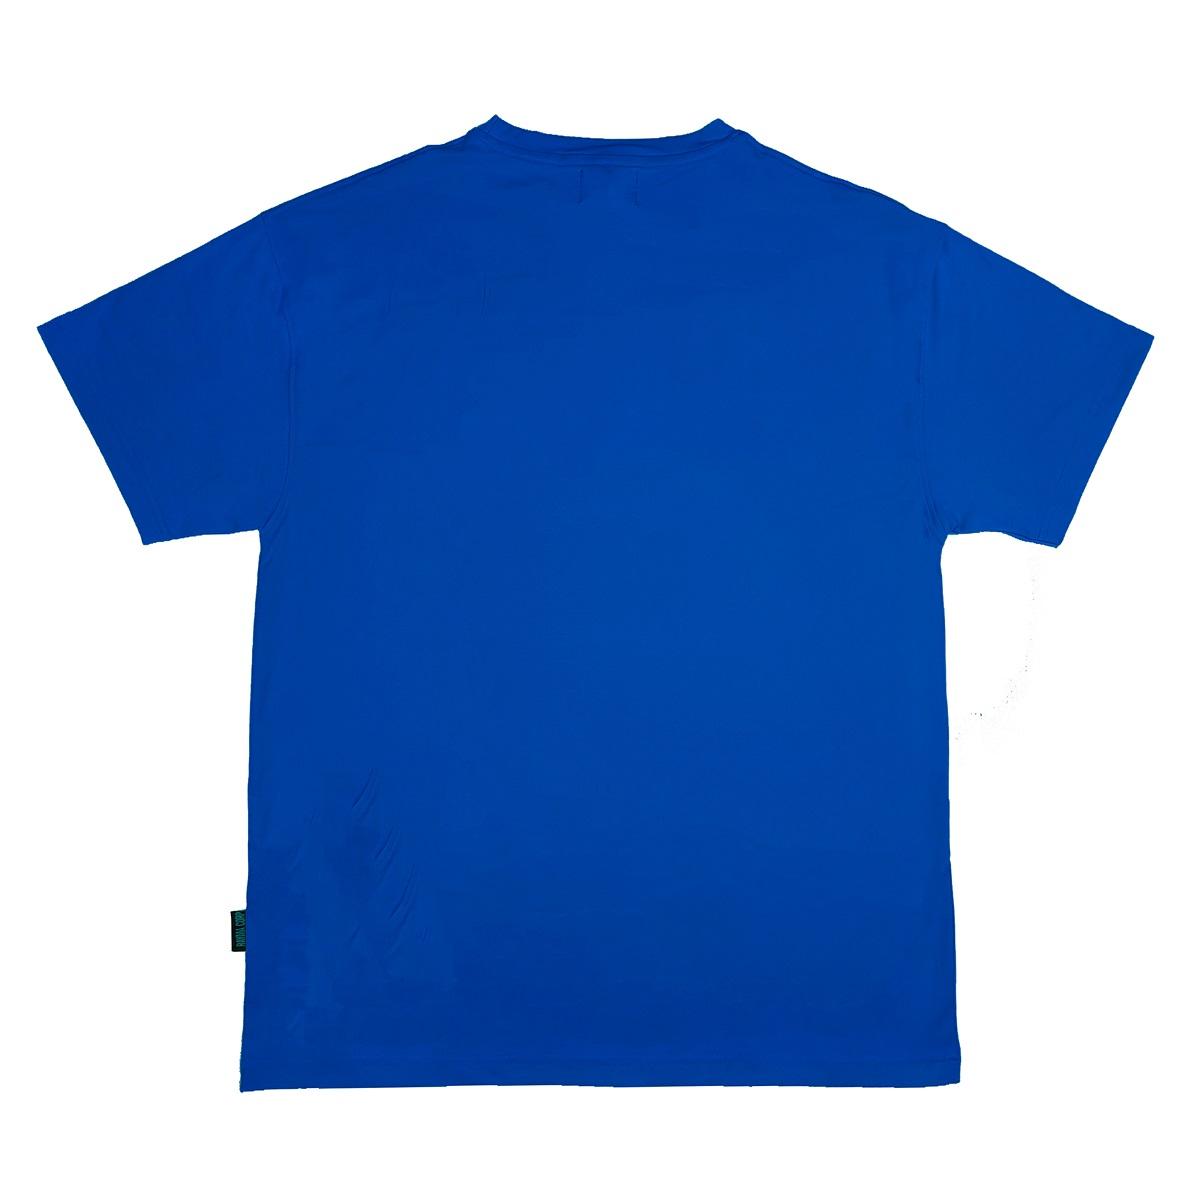 DSW TEE BASIC LOGO - BLUE